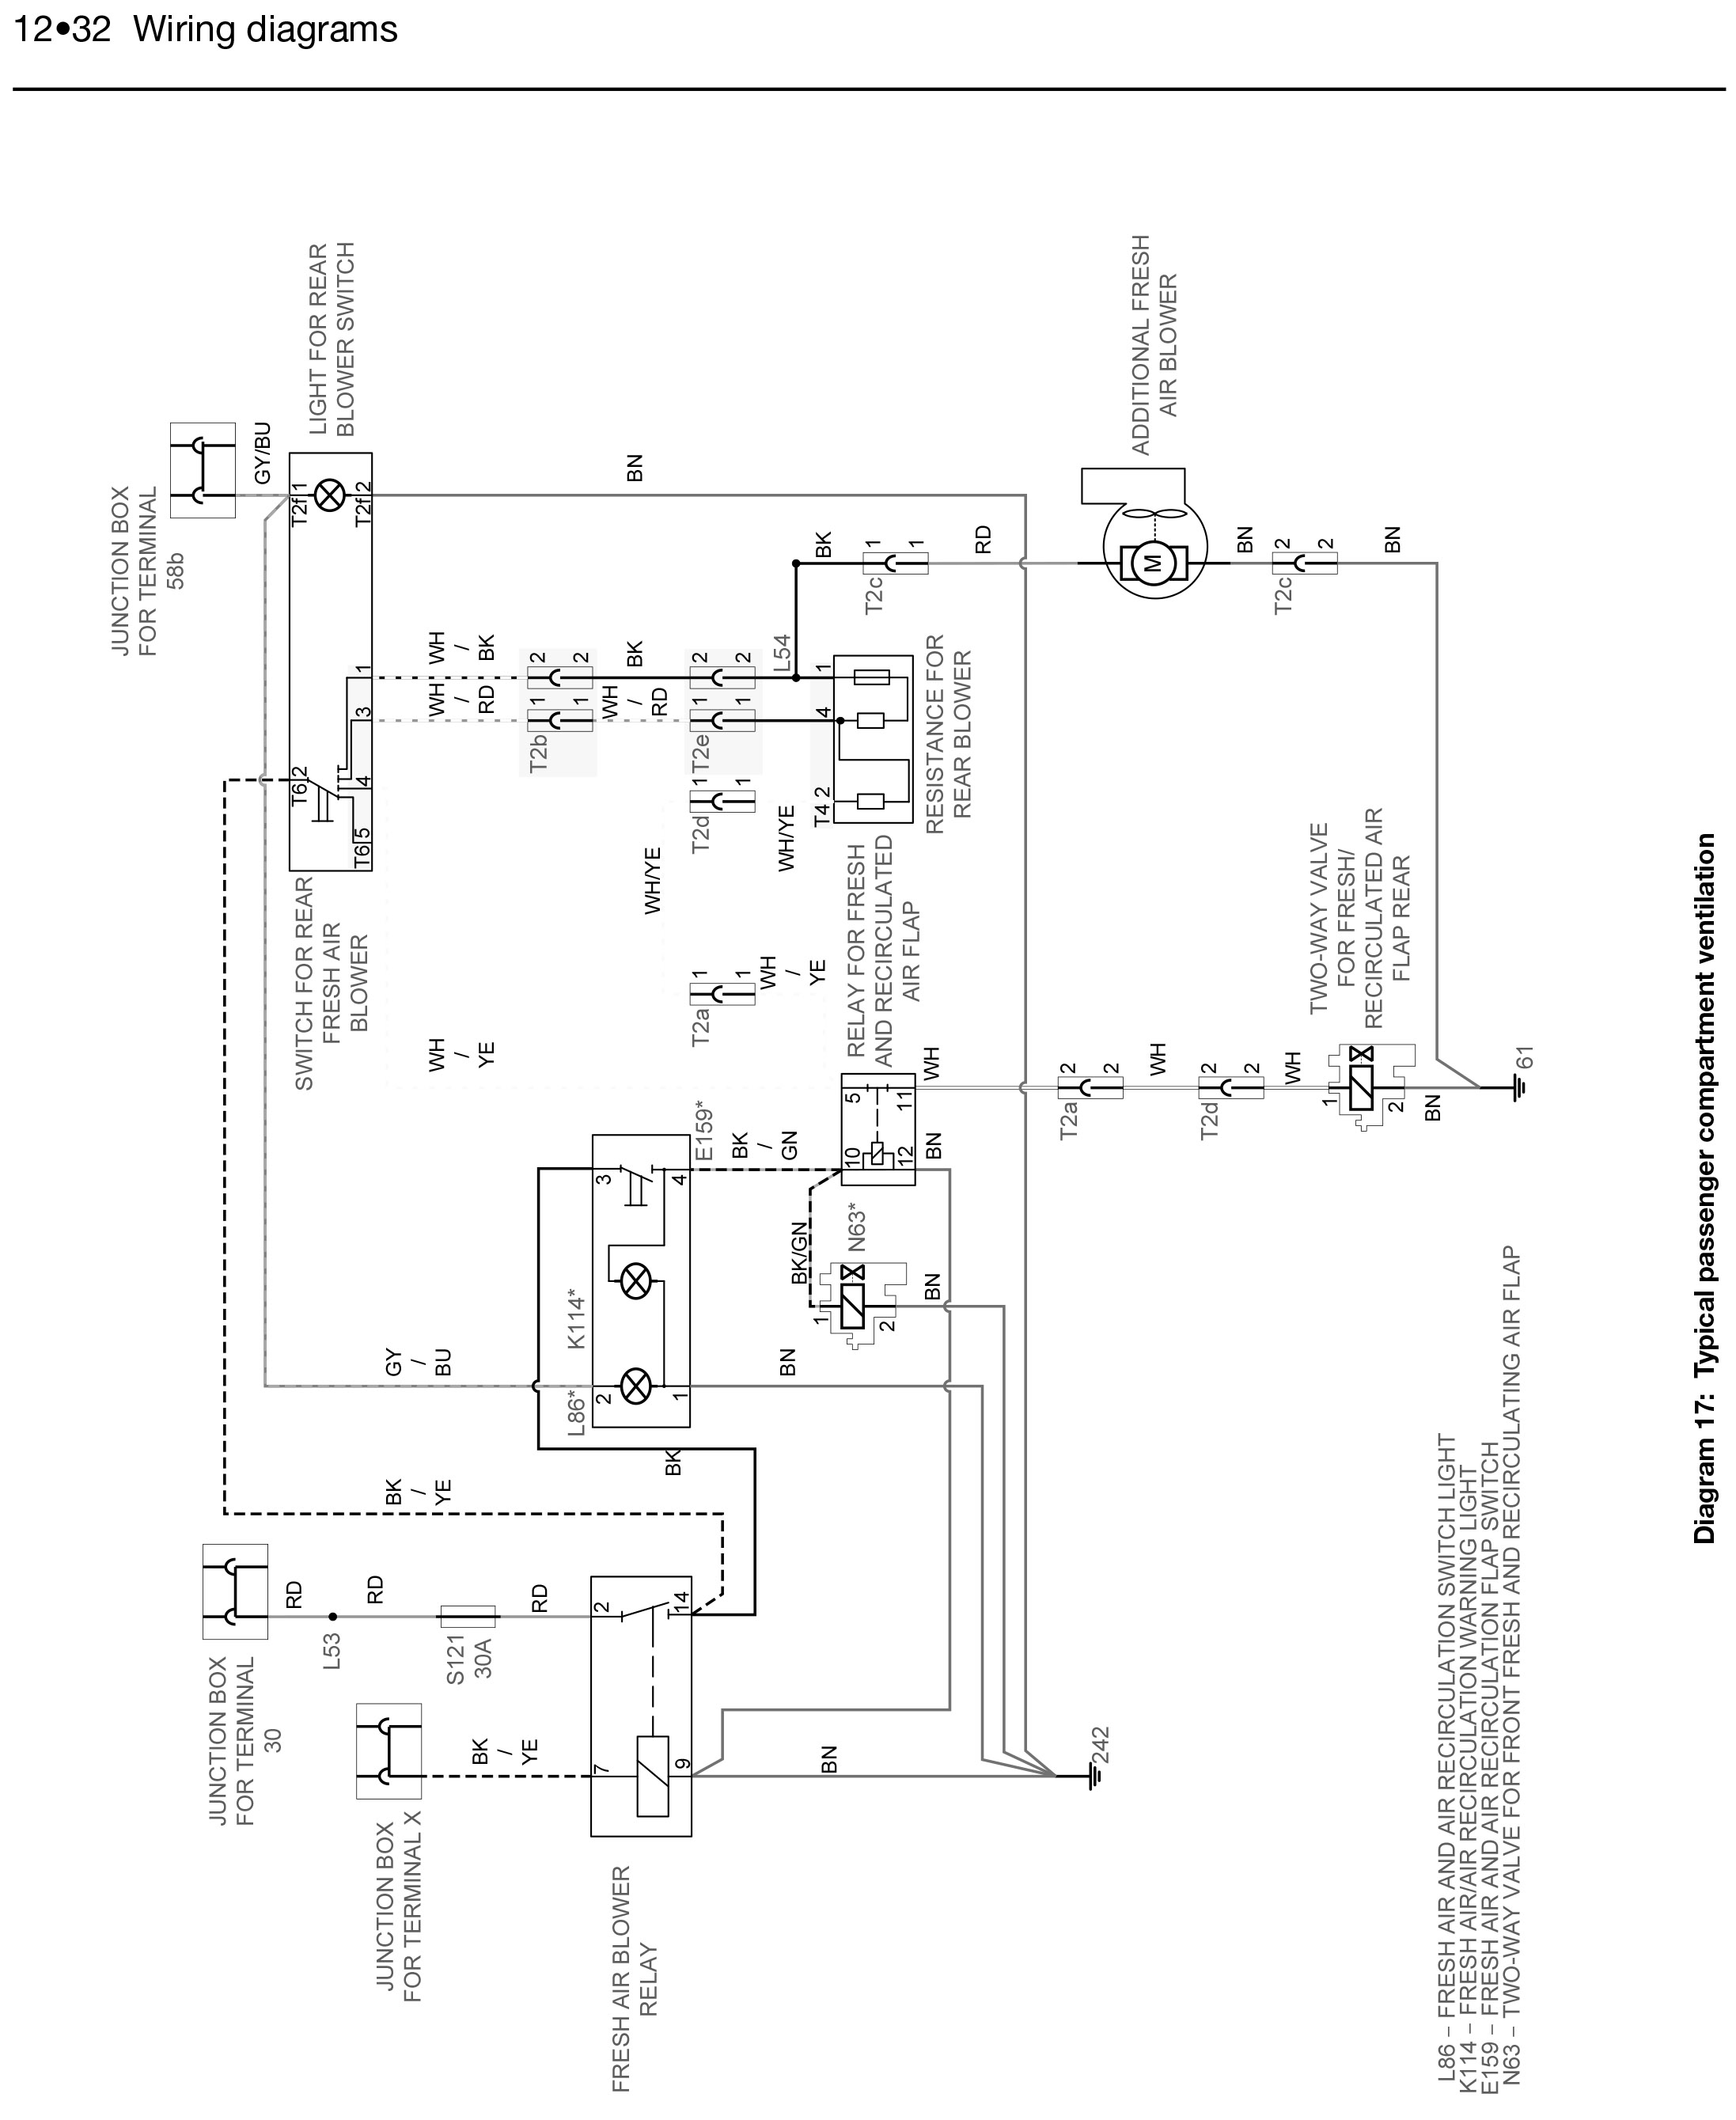 Vw T4 Wiring Diagram - Wiring Diagrams Plug